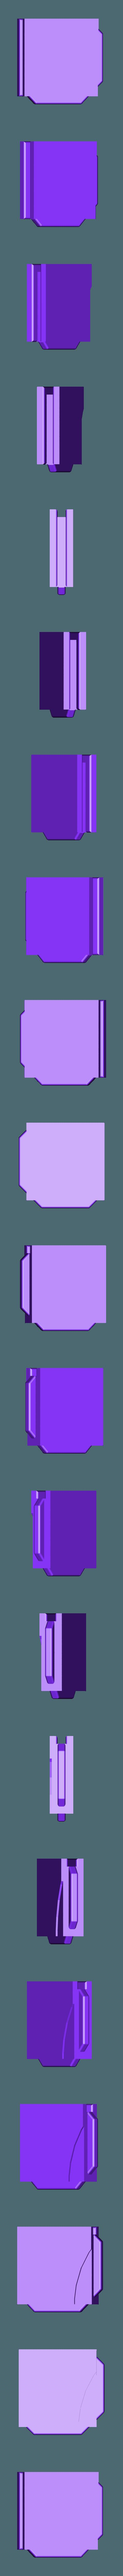 Piece - Part 7.stl Download free STL file Taquin CULTS / Sliding Puzzle • 3D print model, Valelab3D